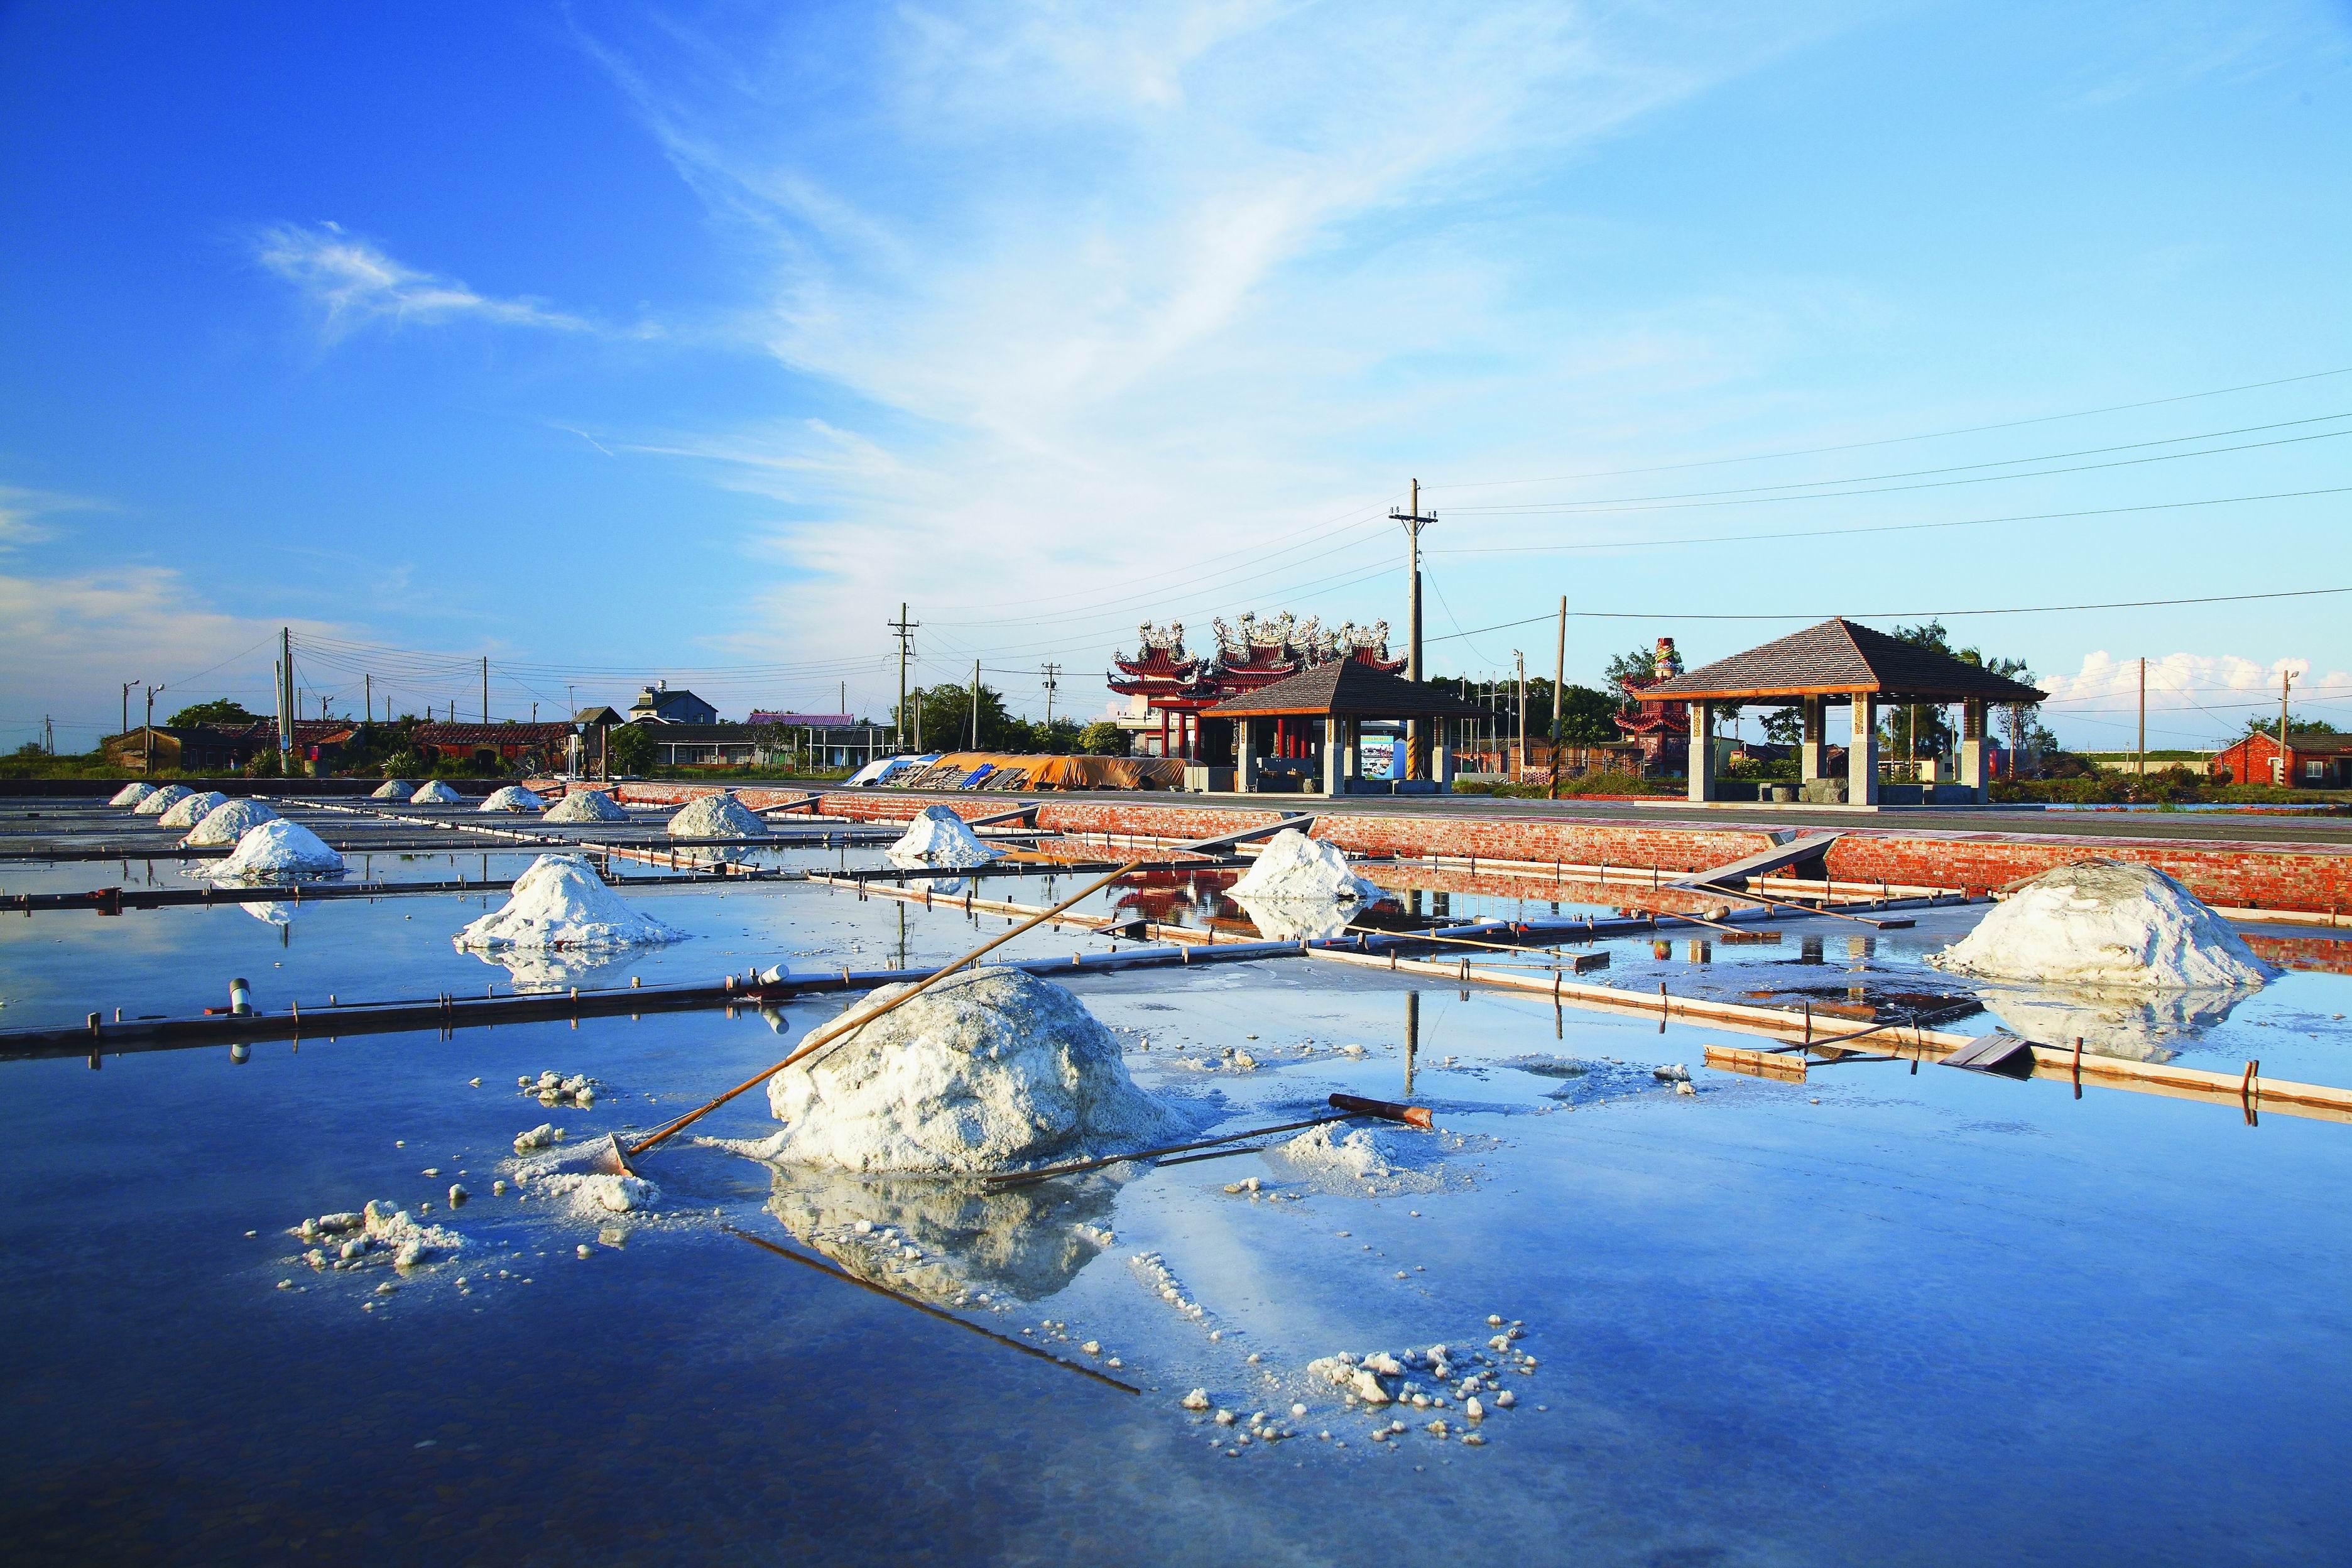 Jingzaijiao Tile-paved Salt Fields